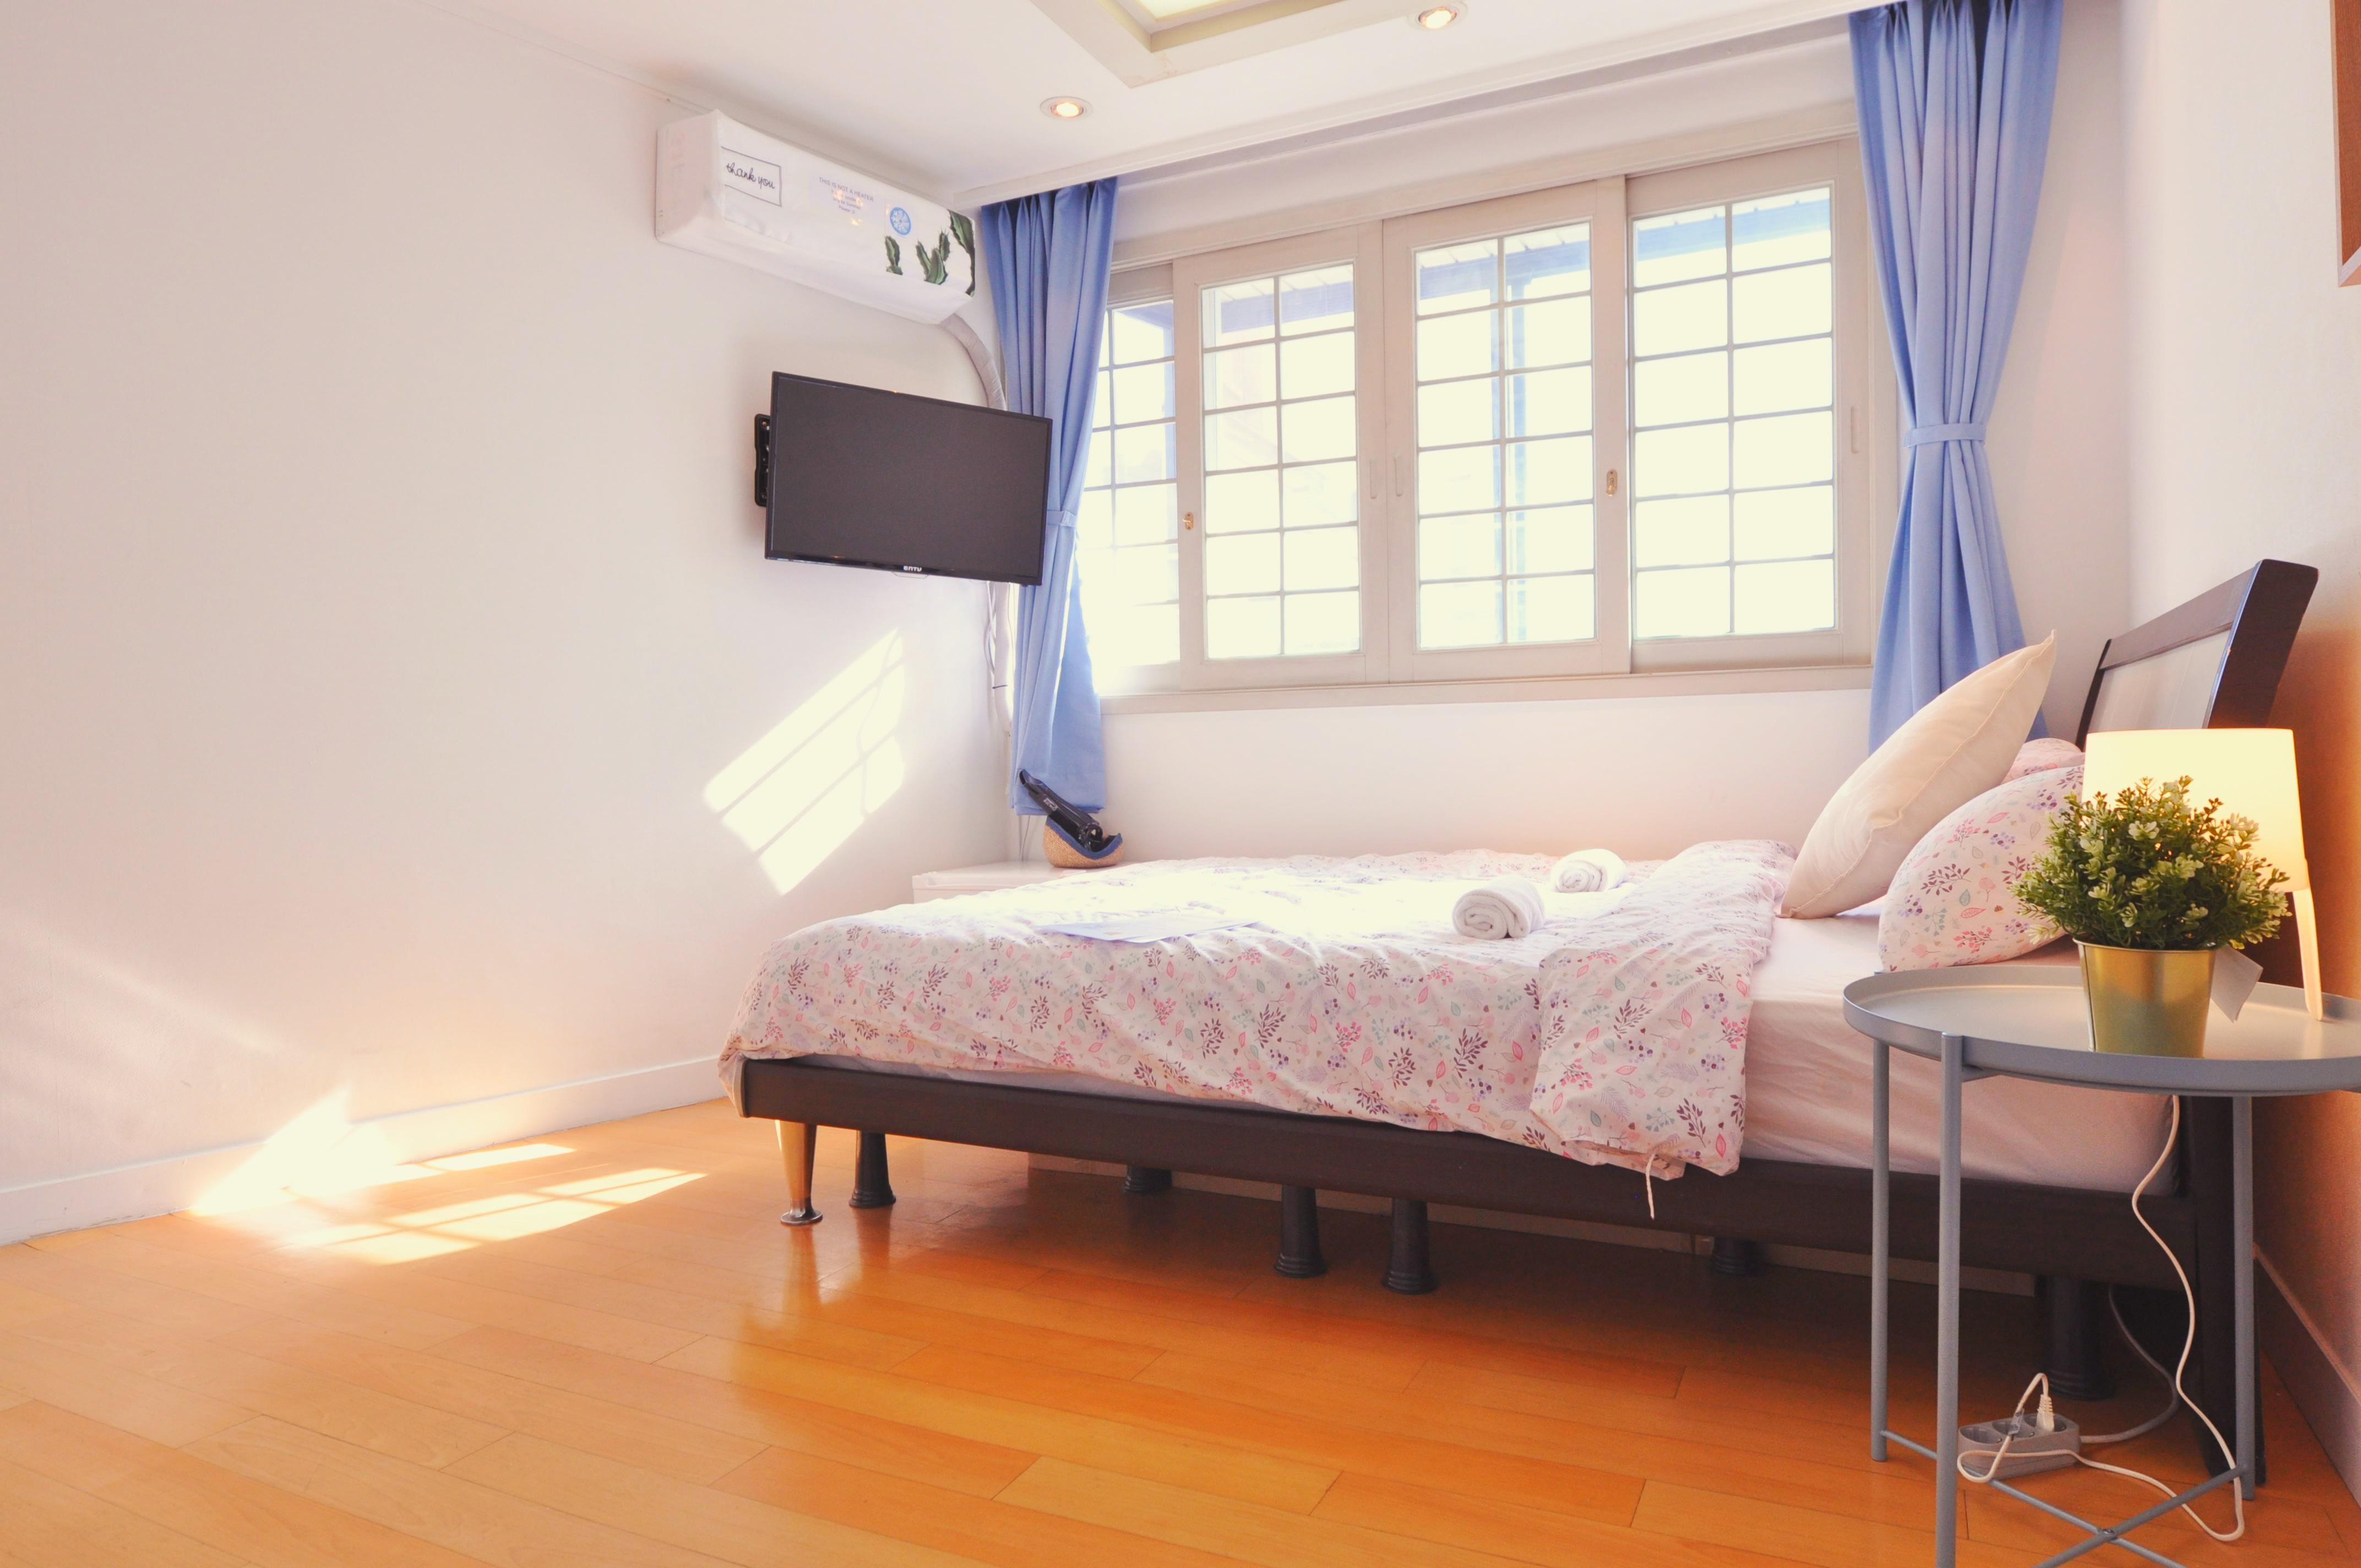 HOSTEL - Myeongdong Rooftop Hostel